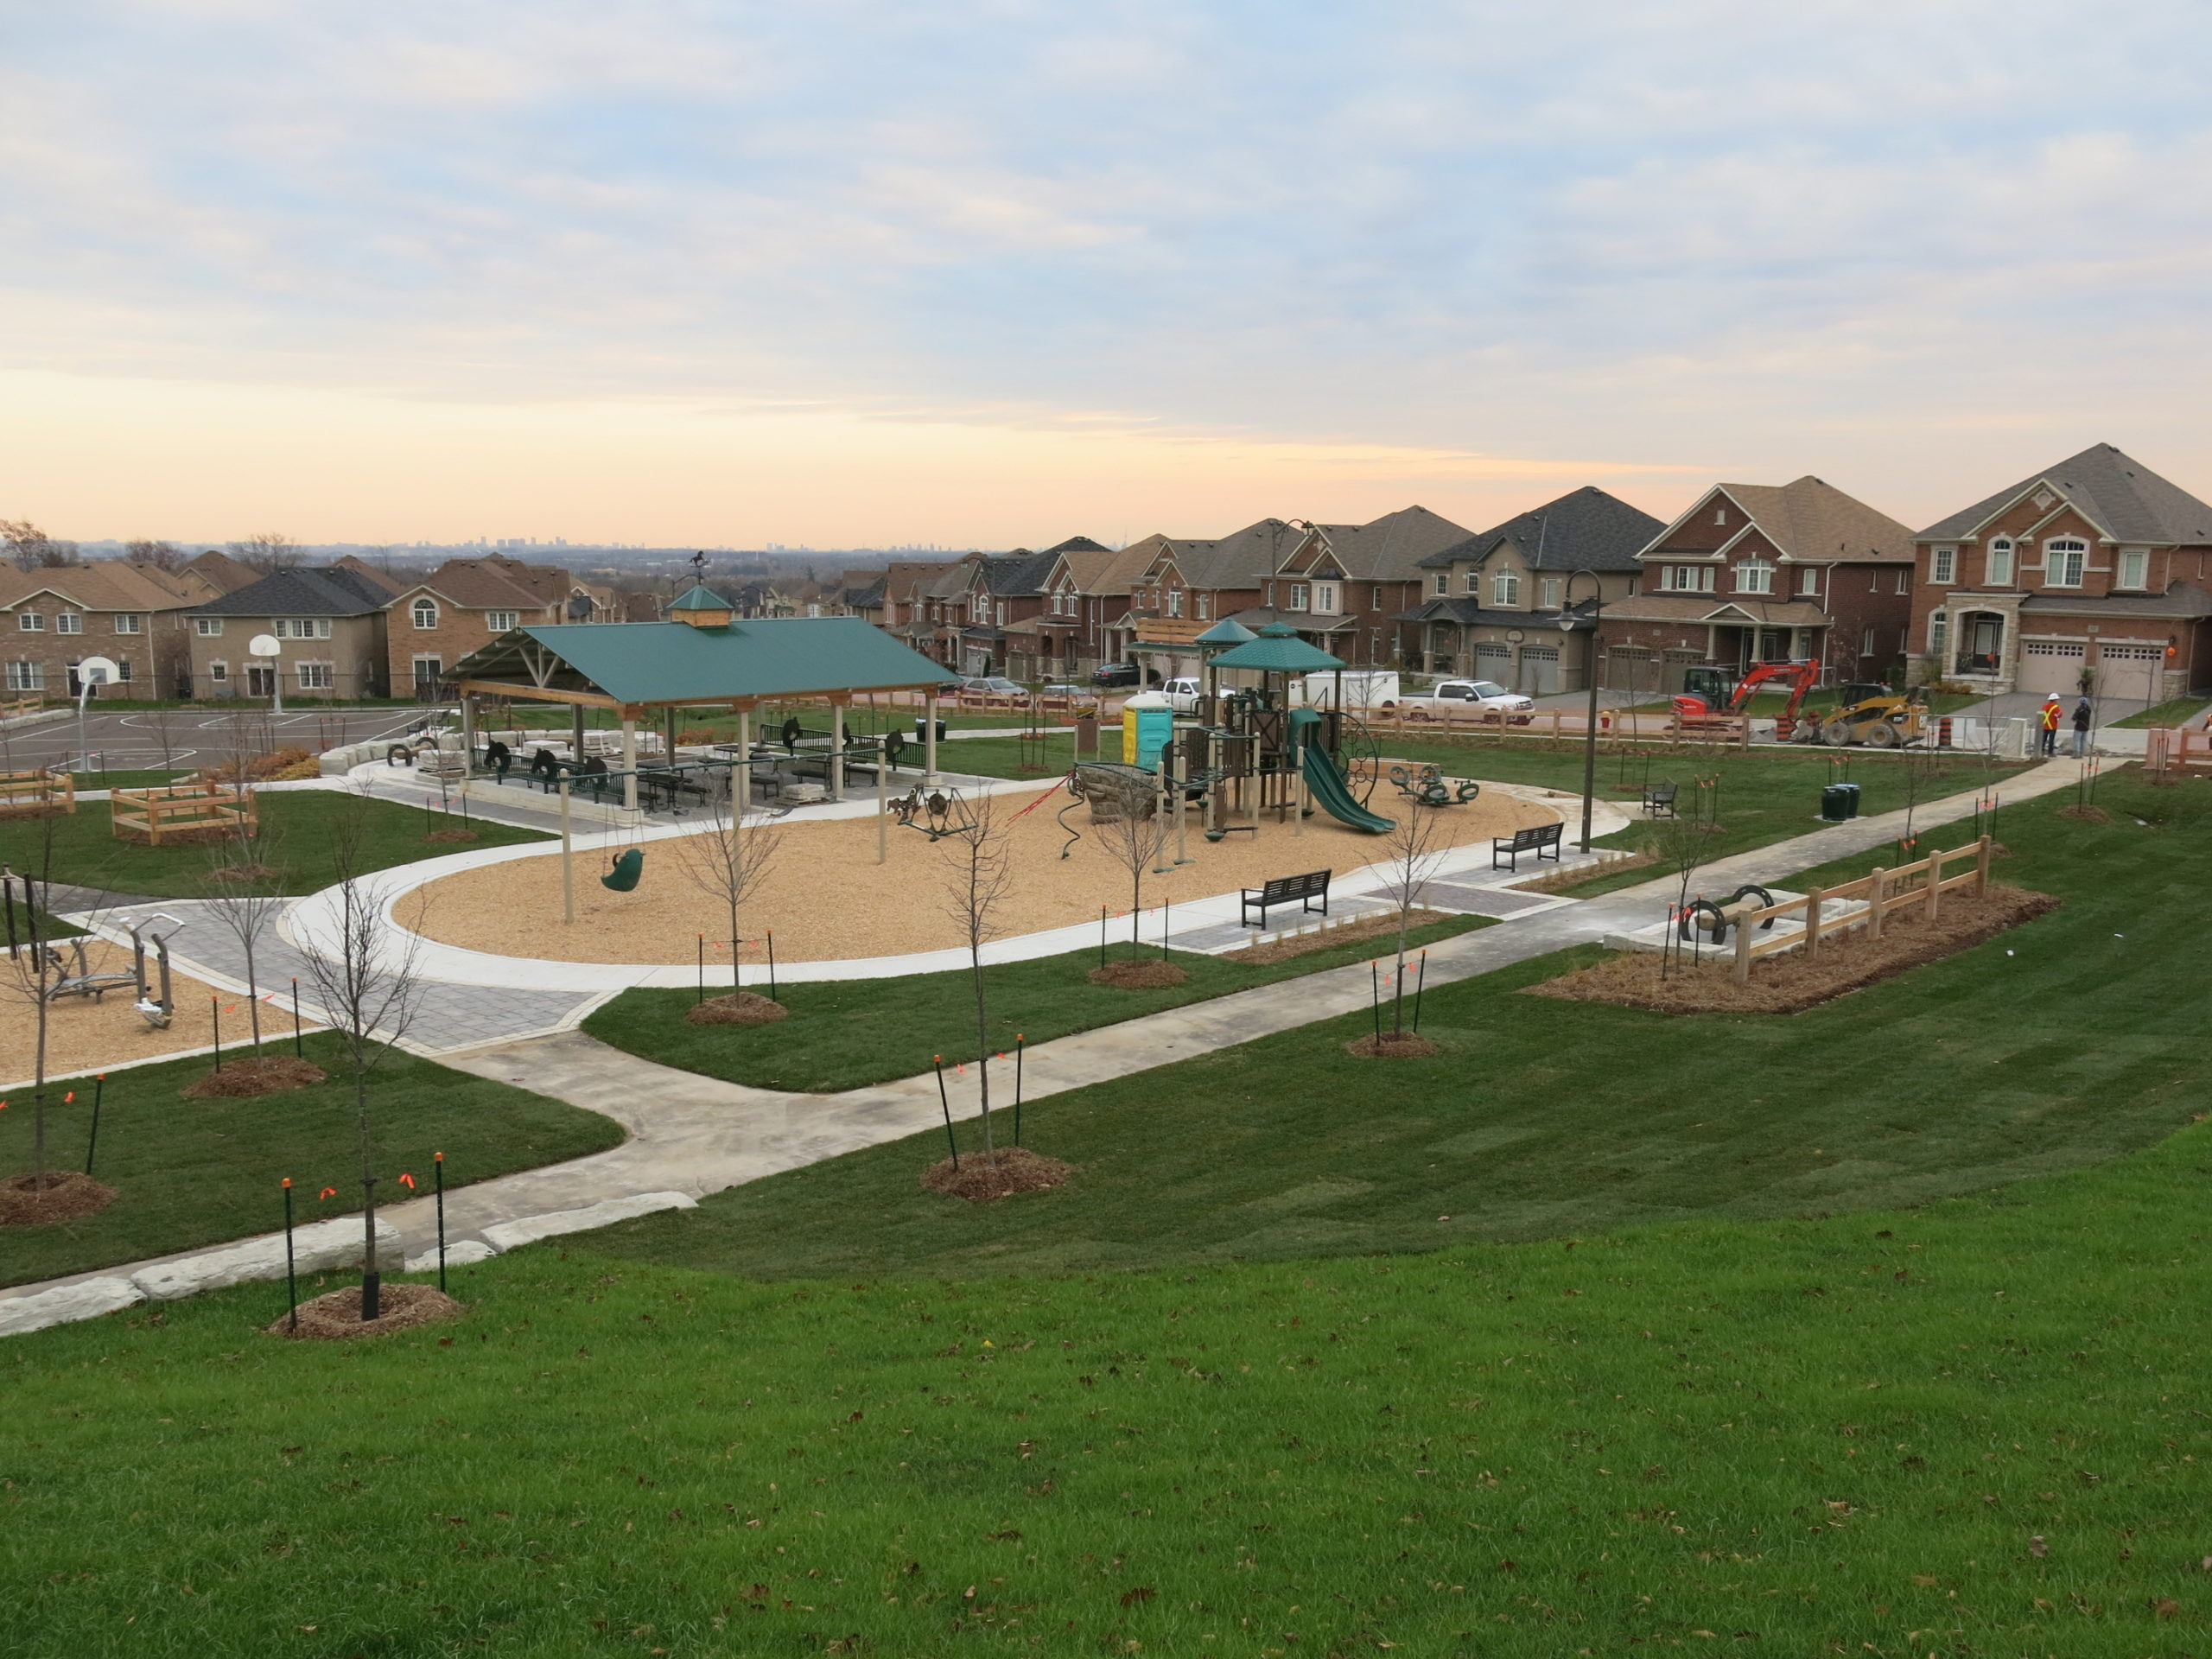 Overview of children's playground.